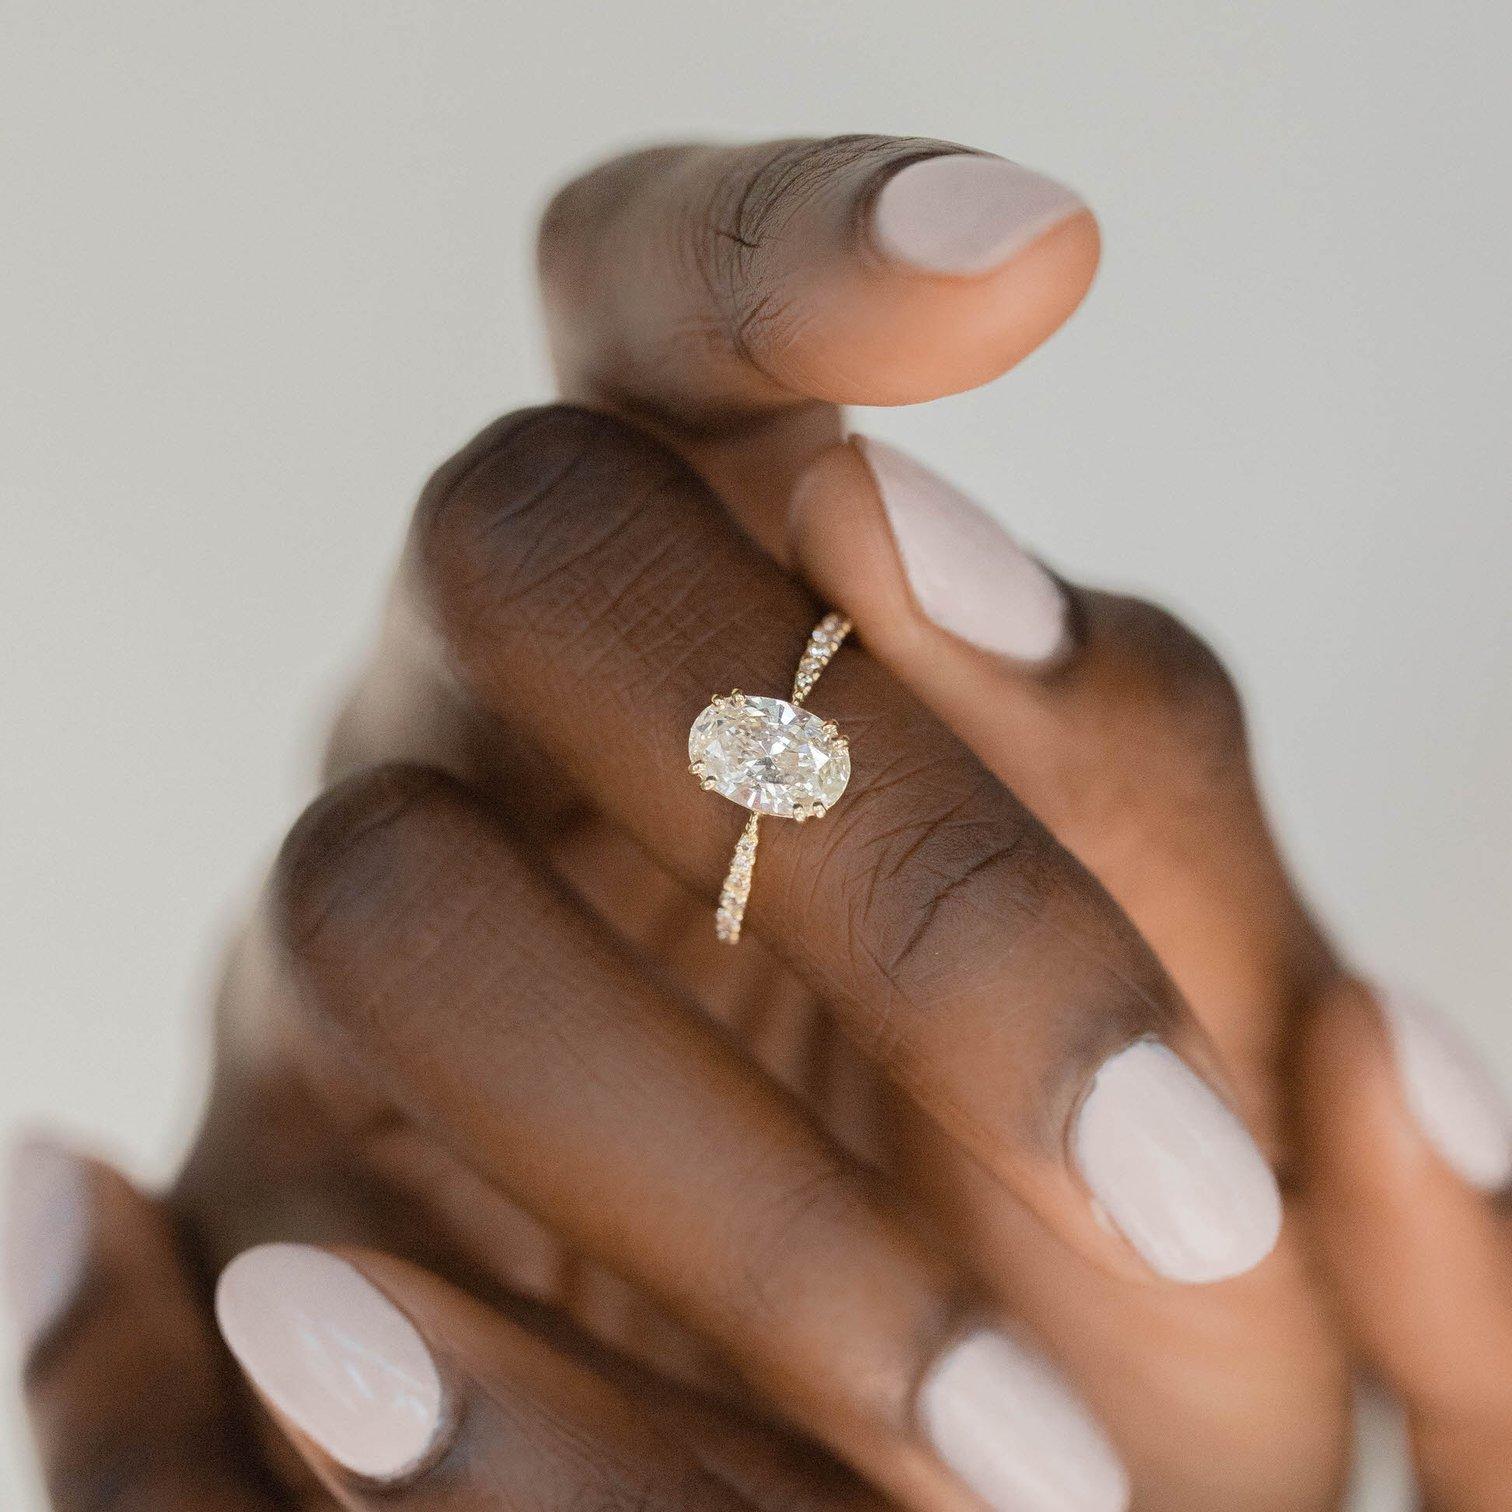 2018-melanie-casey-jewelry-oval-nova-ring-1_2ct-yellow-gold-on-hand-1_1512x.jpg